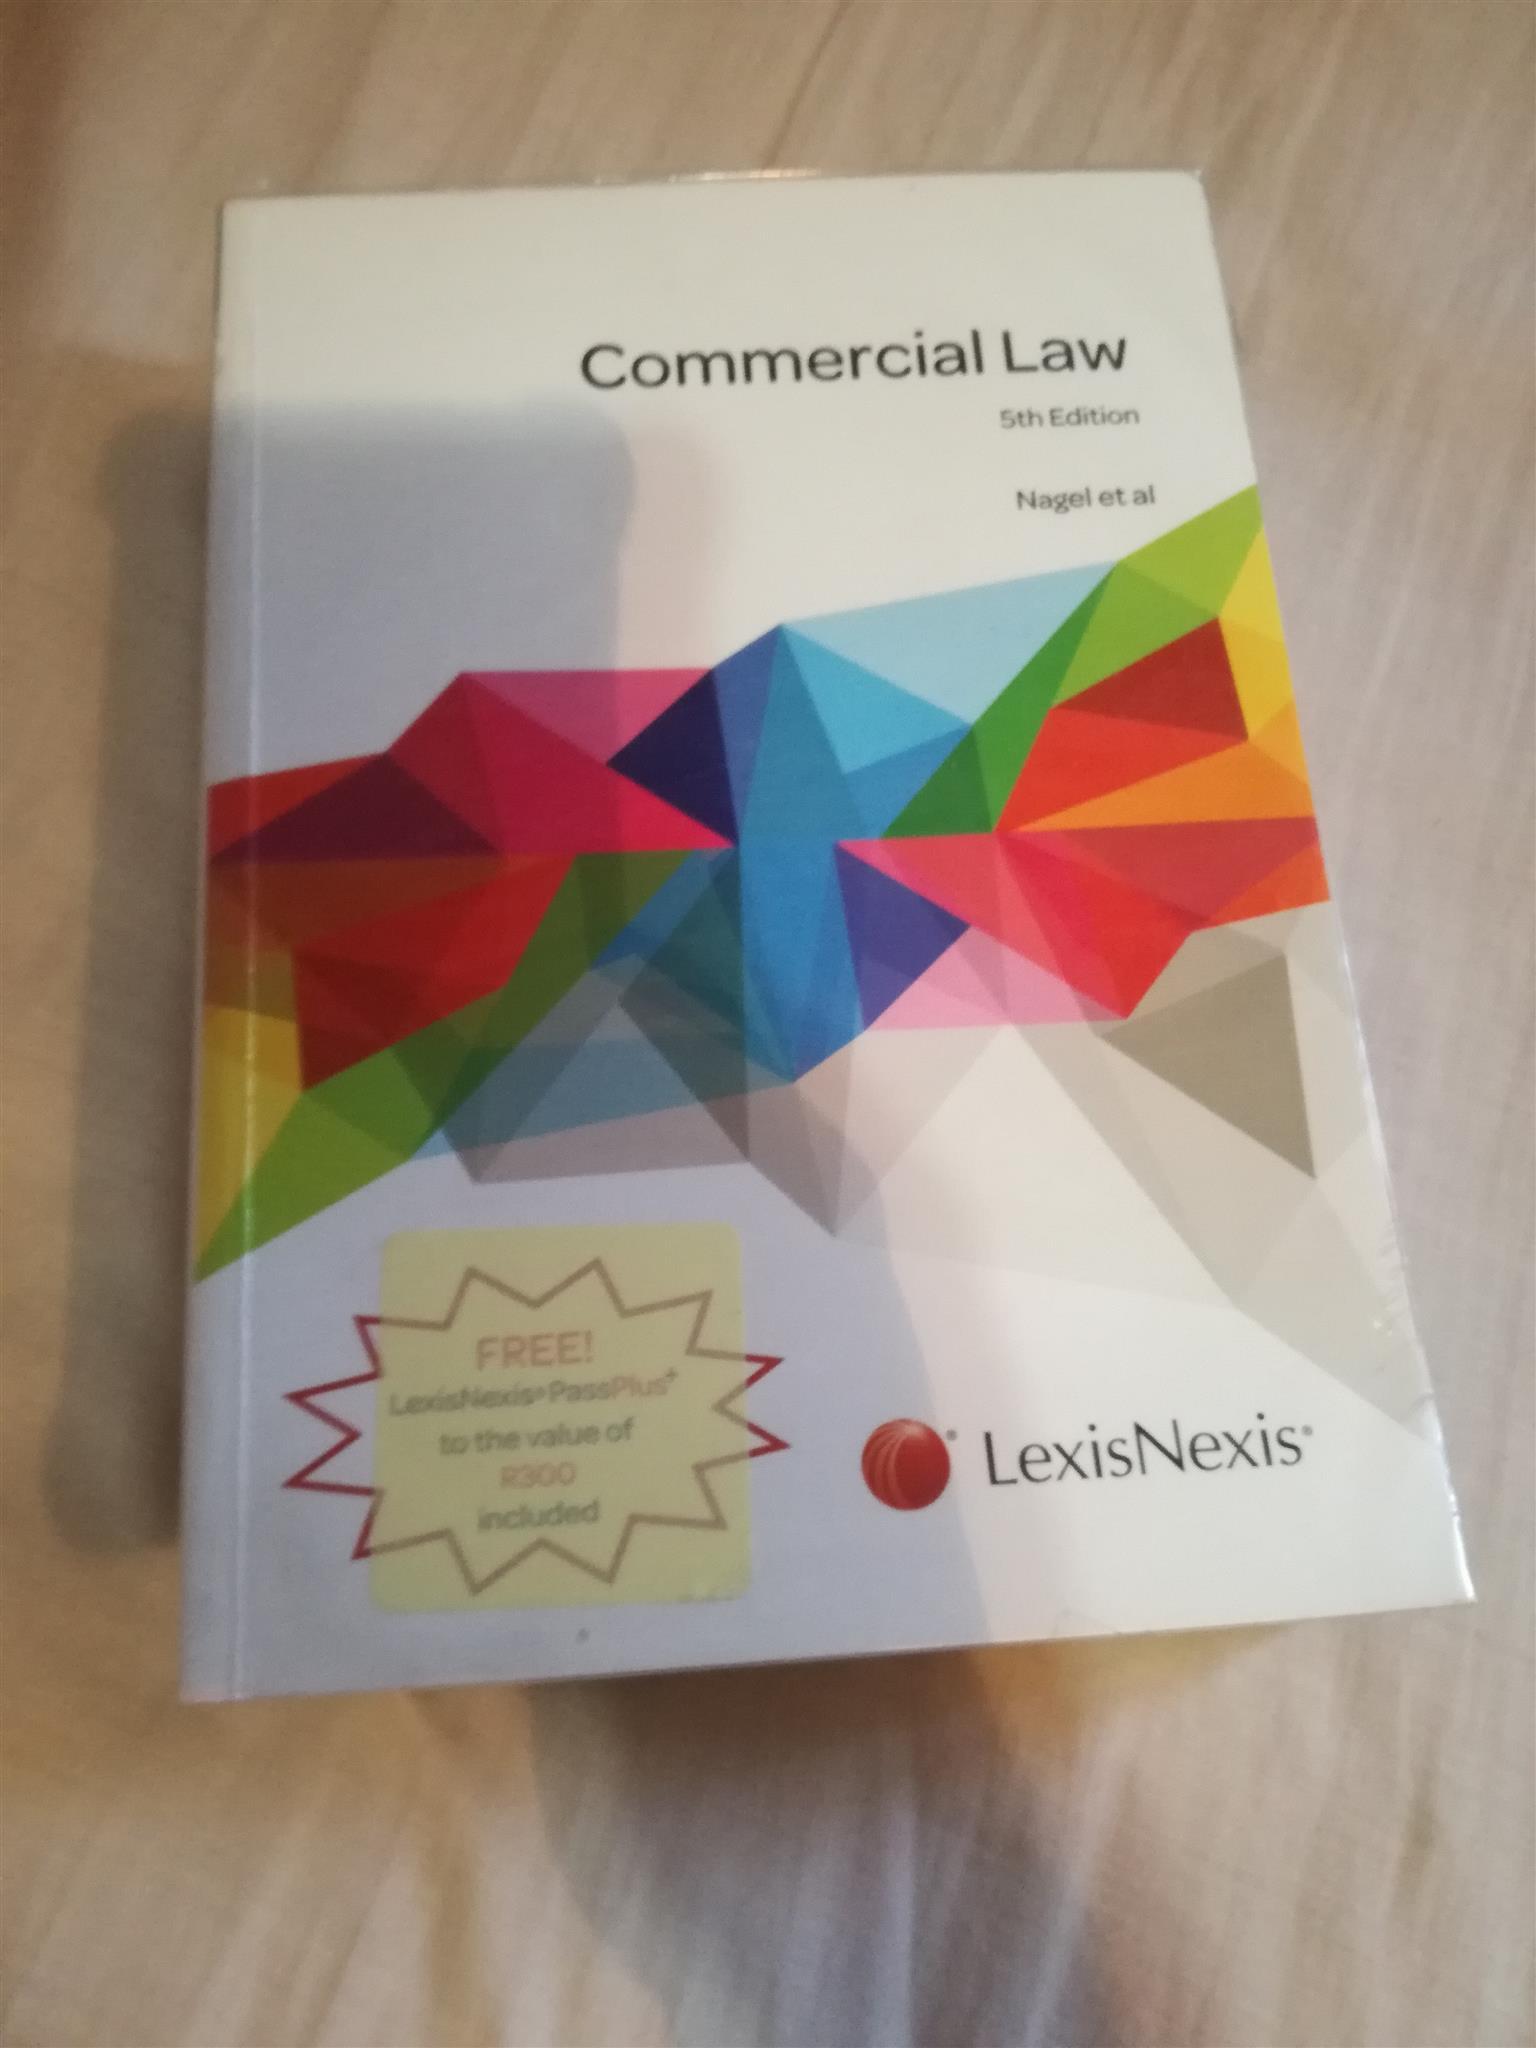 Commercial Law 5th edition Nagel et al